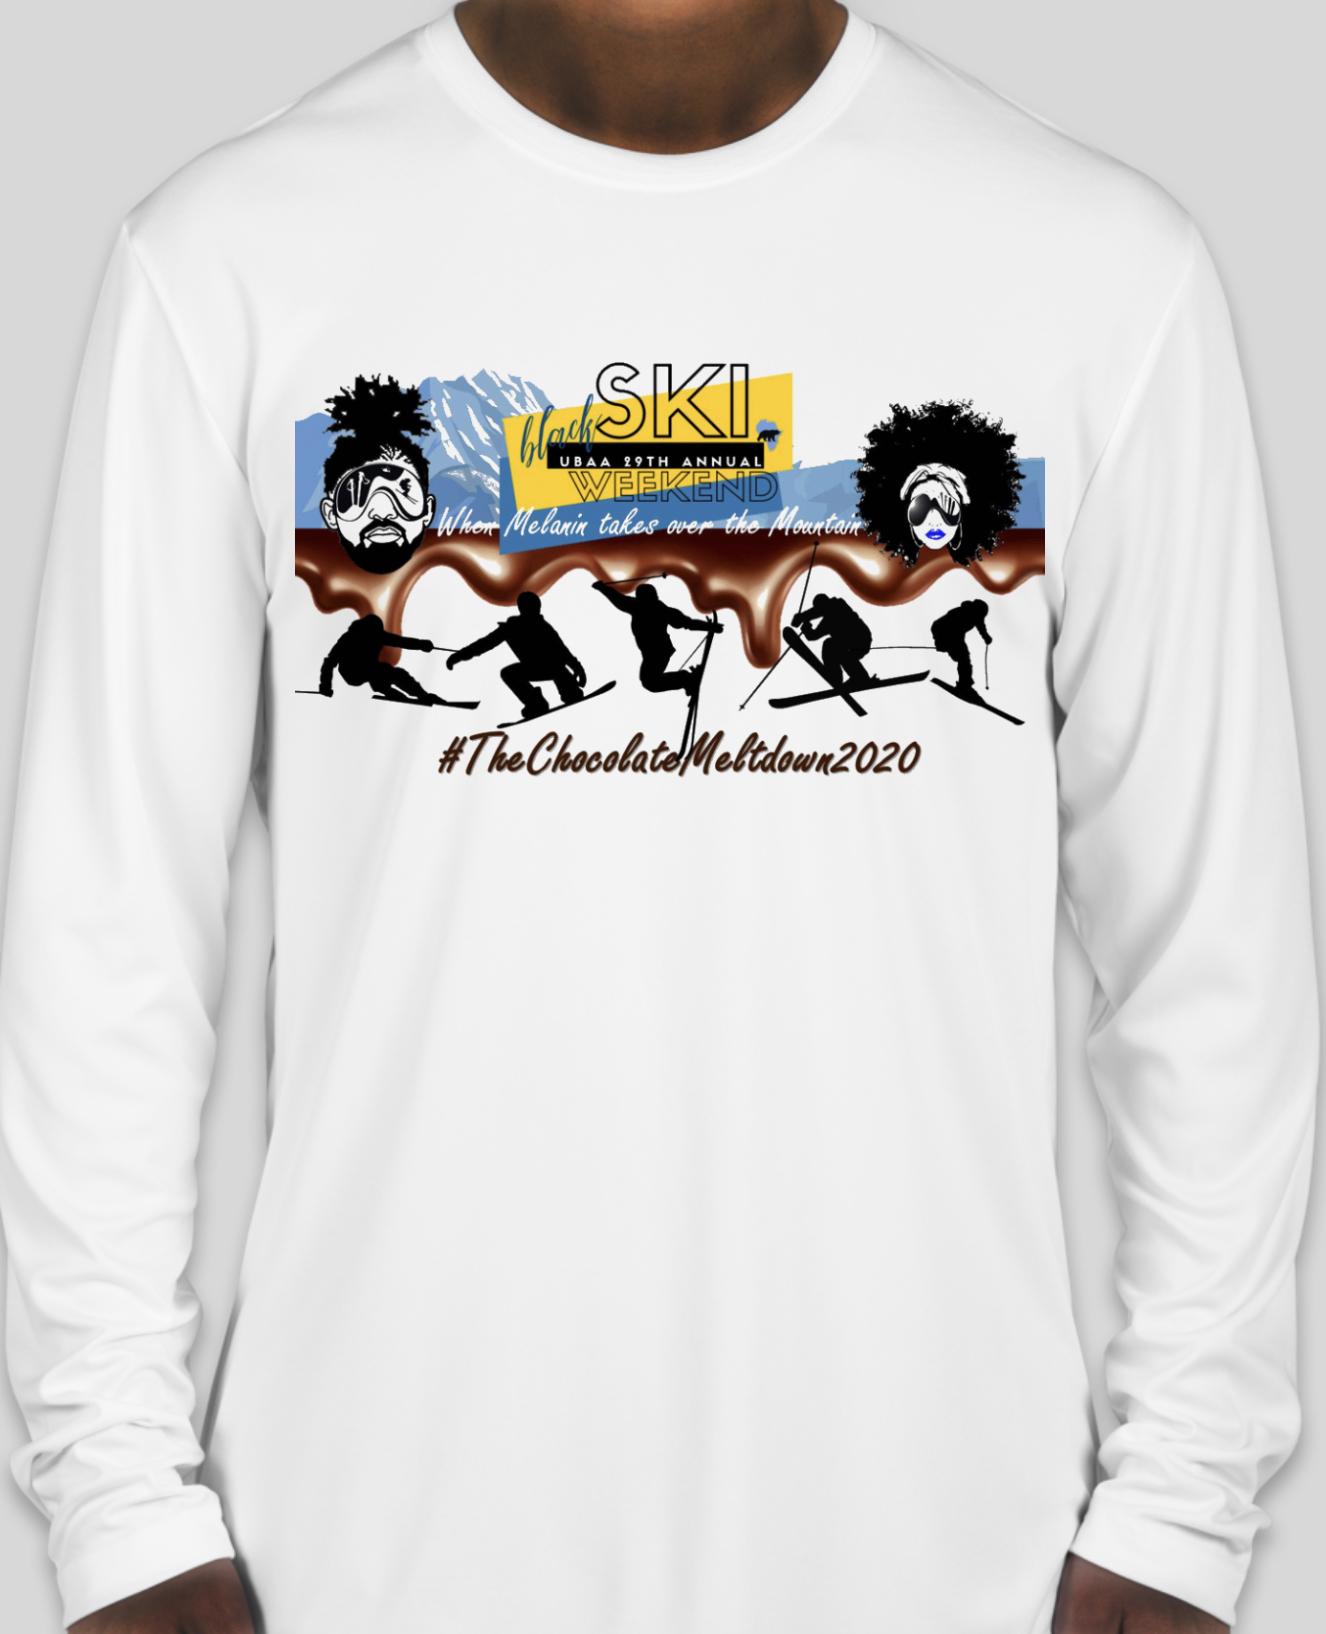 29th Annual Black Ski Weekend Long Sleeve T-Shirt